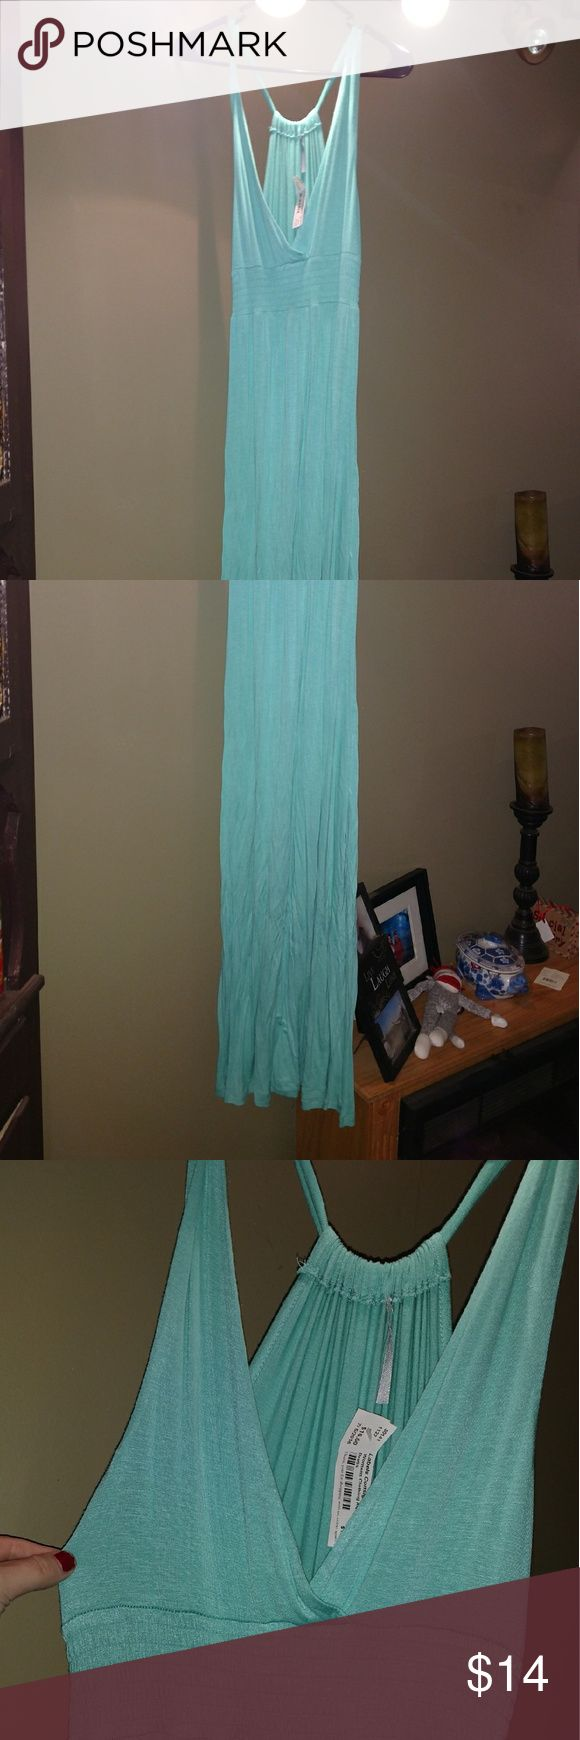 Teal maxi dress Teal colored maxi dress. Very cute for the beach or summer zinga Dresses Maxi